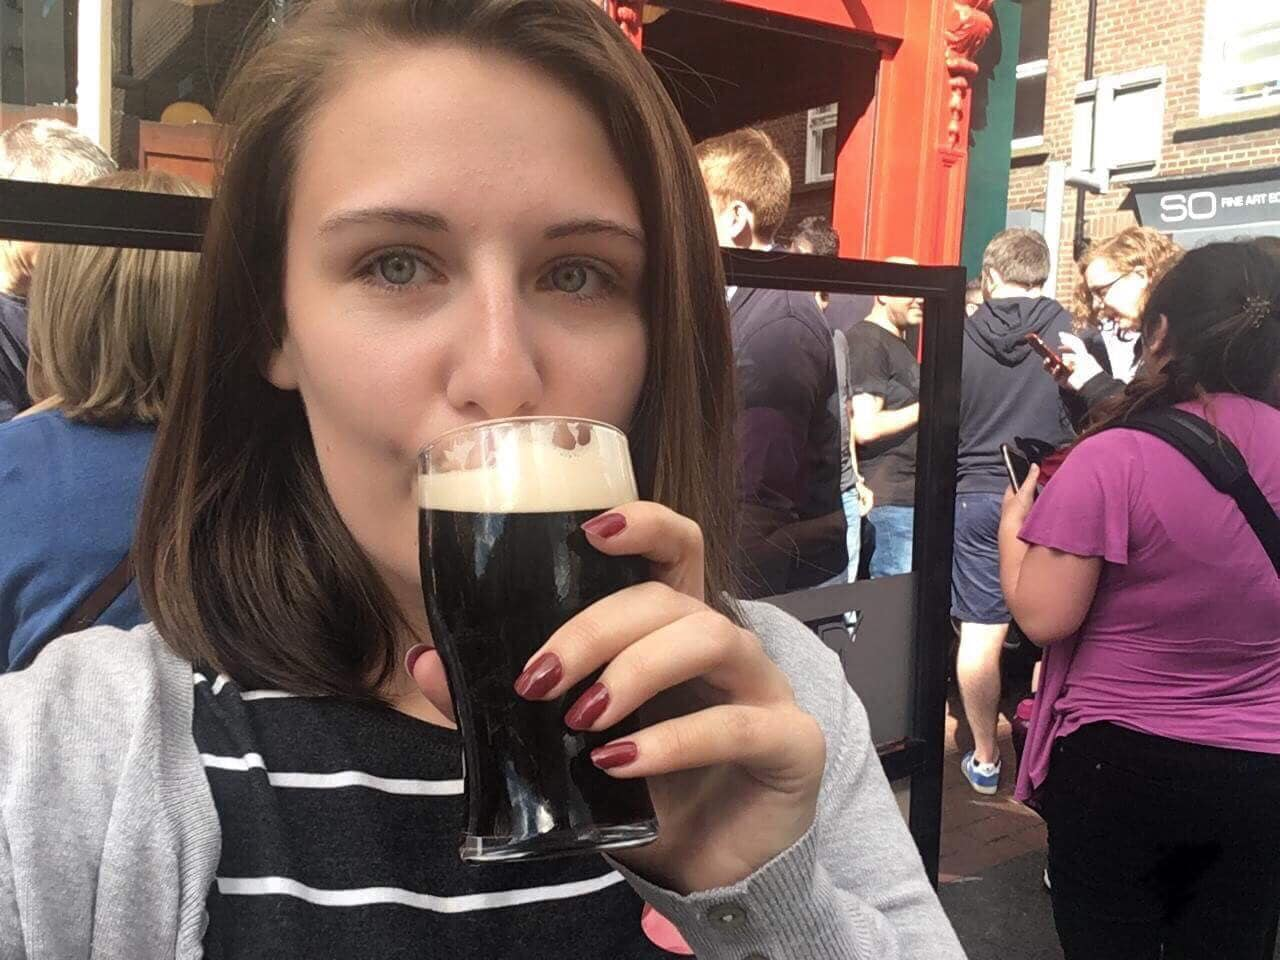 British Isles Princess Cruise Excursions Dublin Guinness Walking Tour Pub Visit